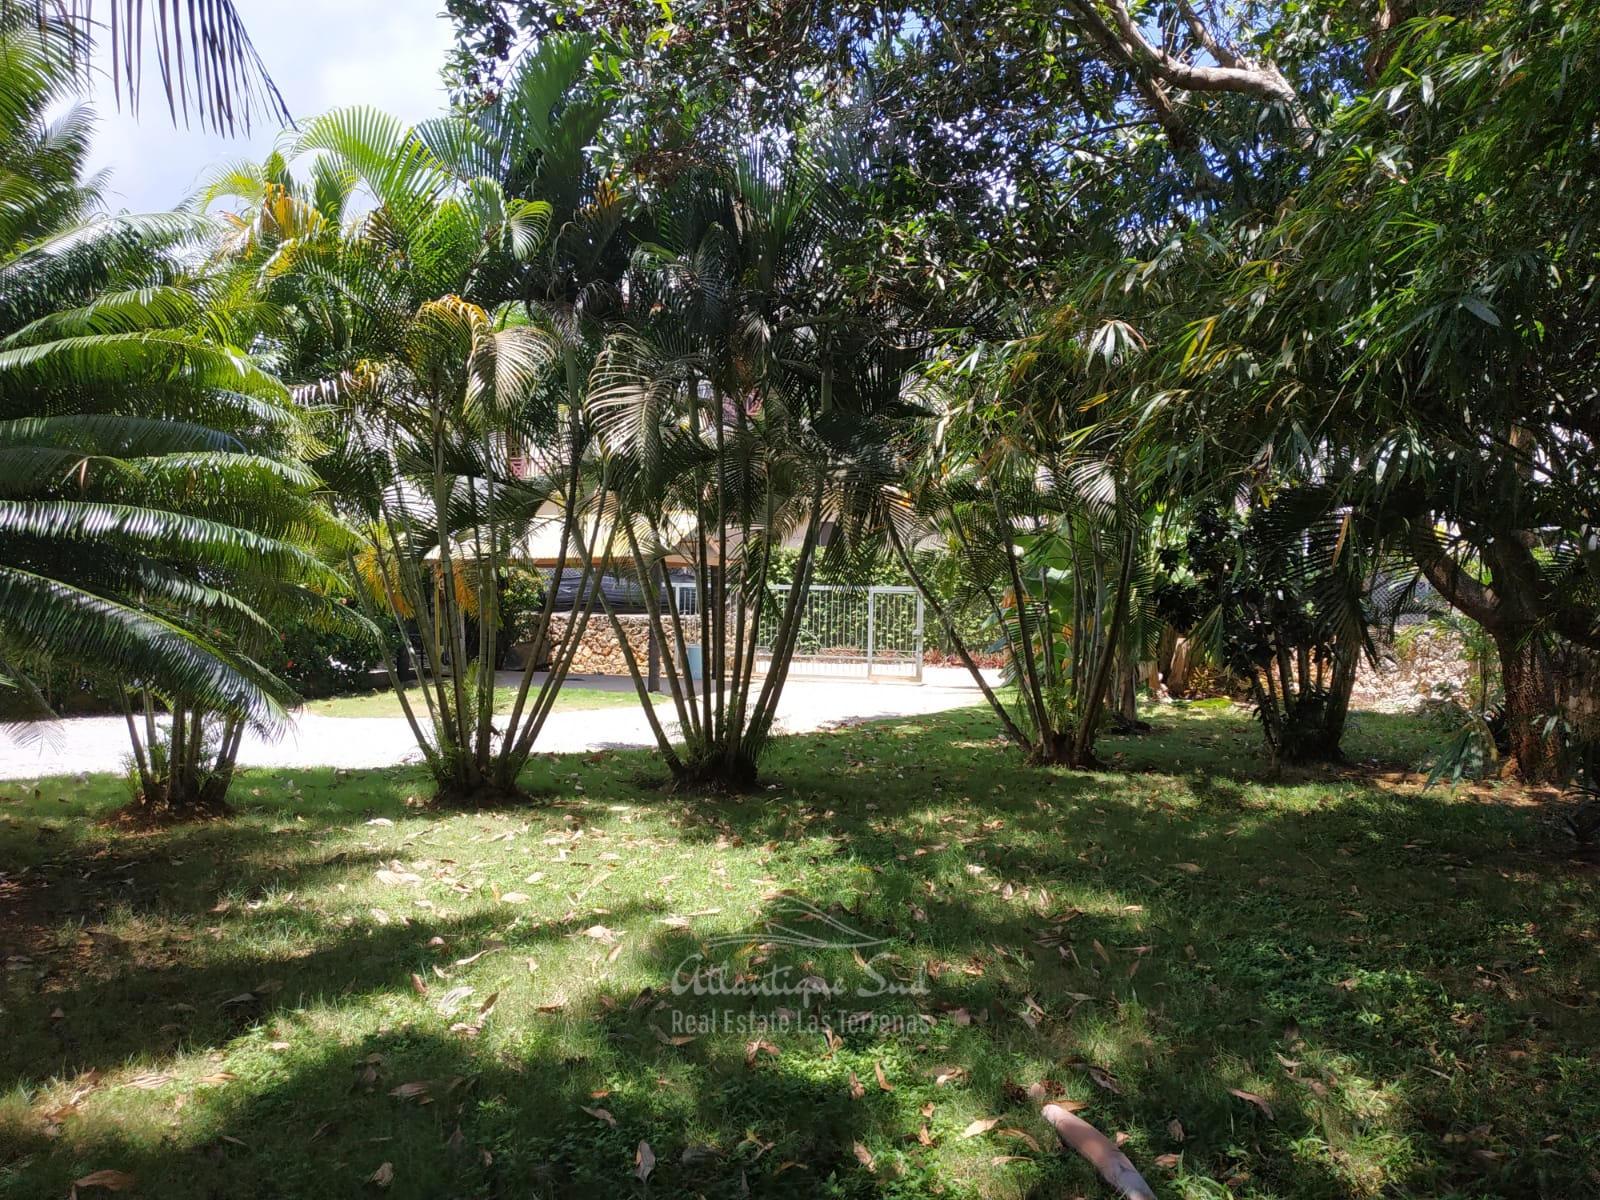 Villa Authentic Carribean Real Estate Las Terrenas Dominican Republic19.jpg